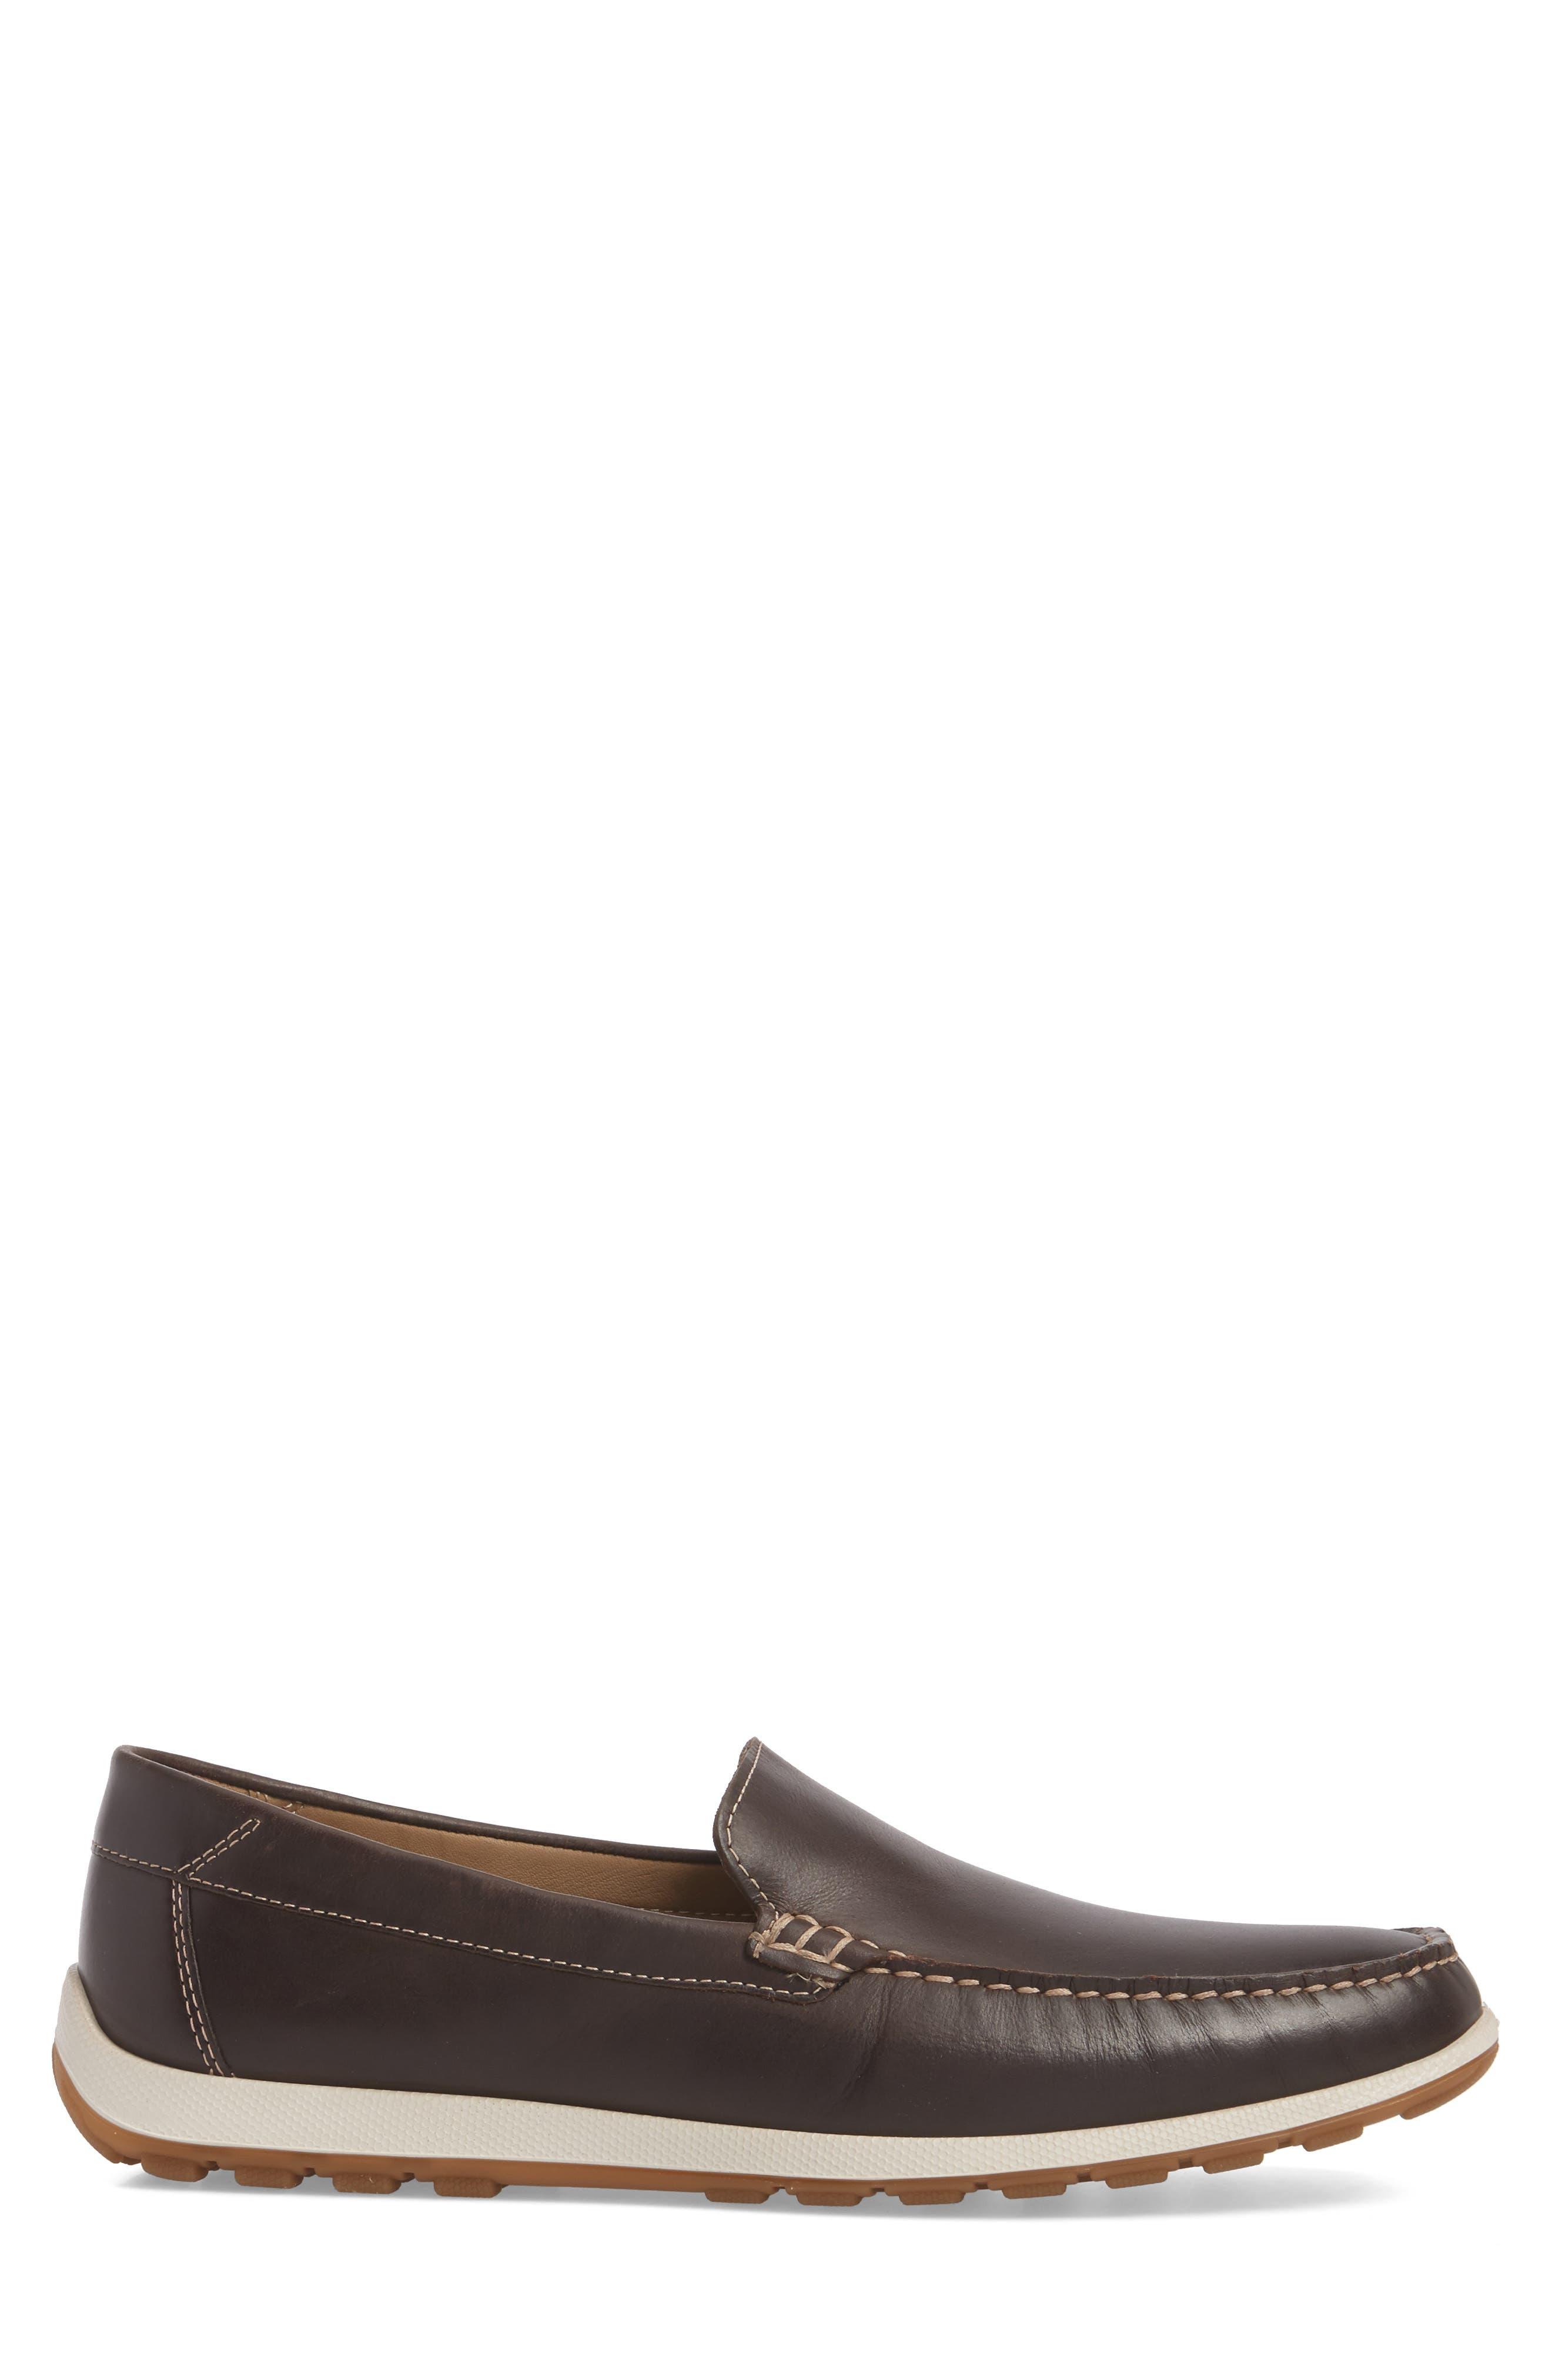 Dip Moc Toe Driving Loafer,                             Alternate thumbnail 3, color,                             Mocha Leather